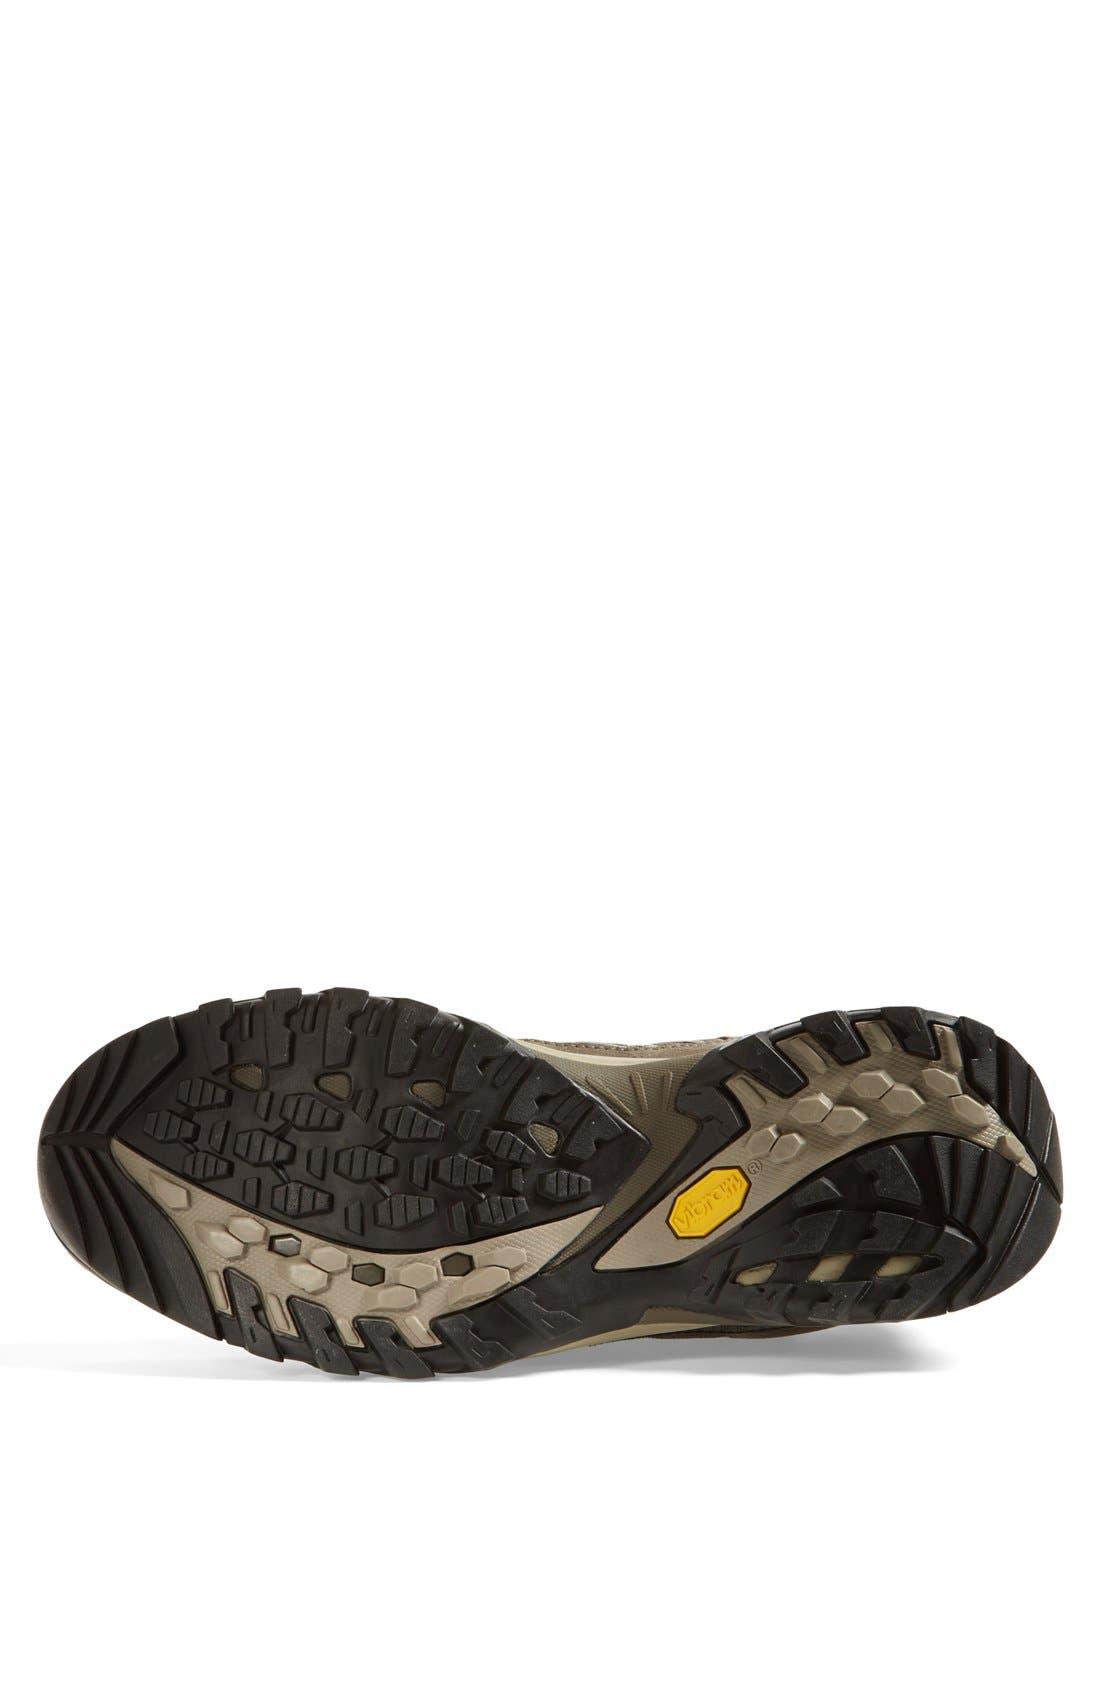 Alternate Image 4  - The North Face 'Storm WP' Hiking Shoe (Men)